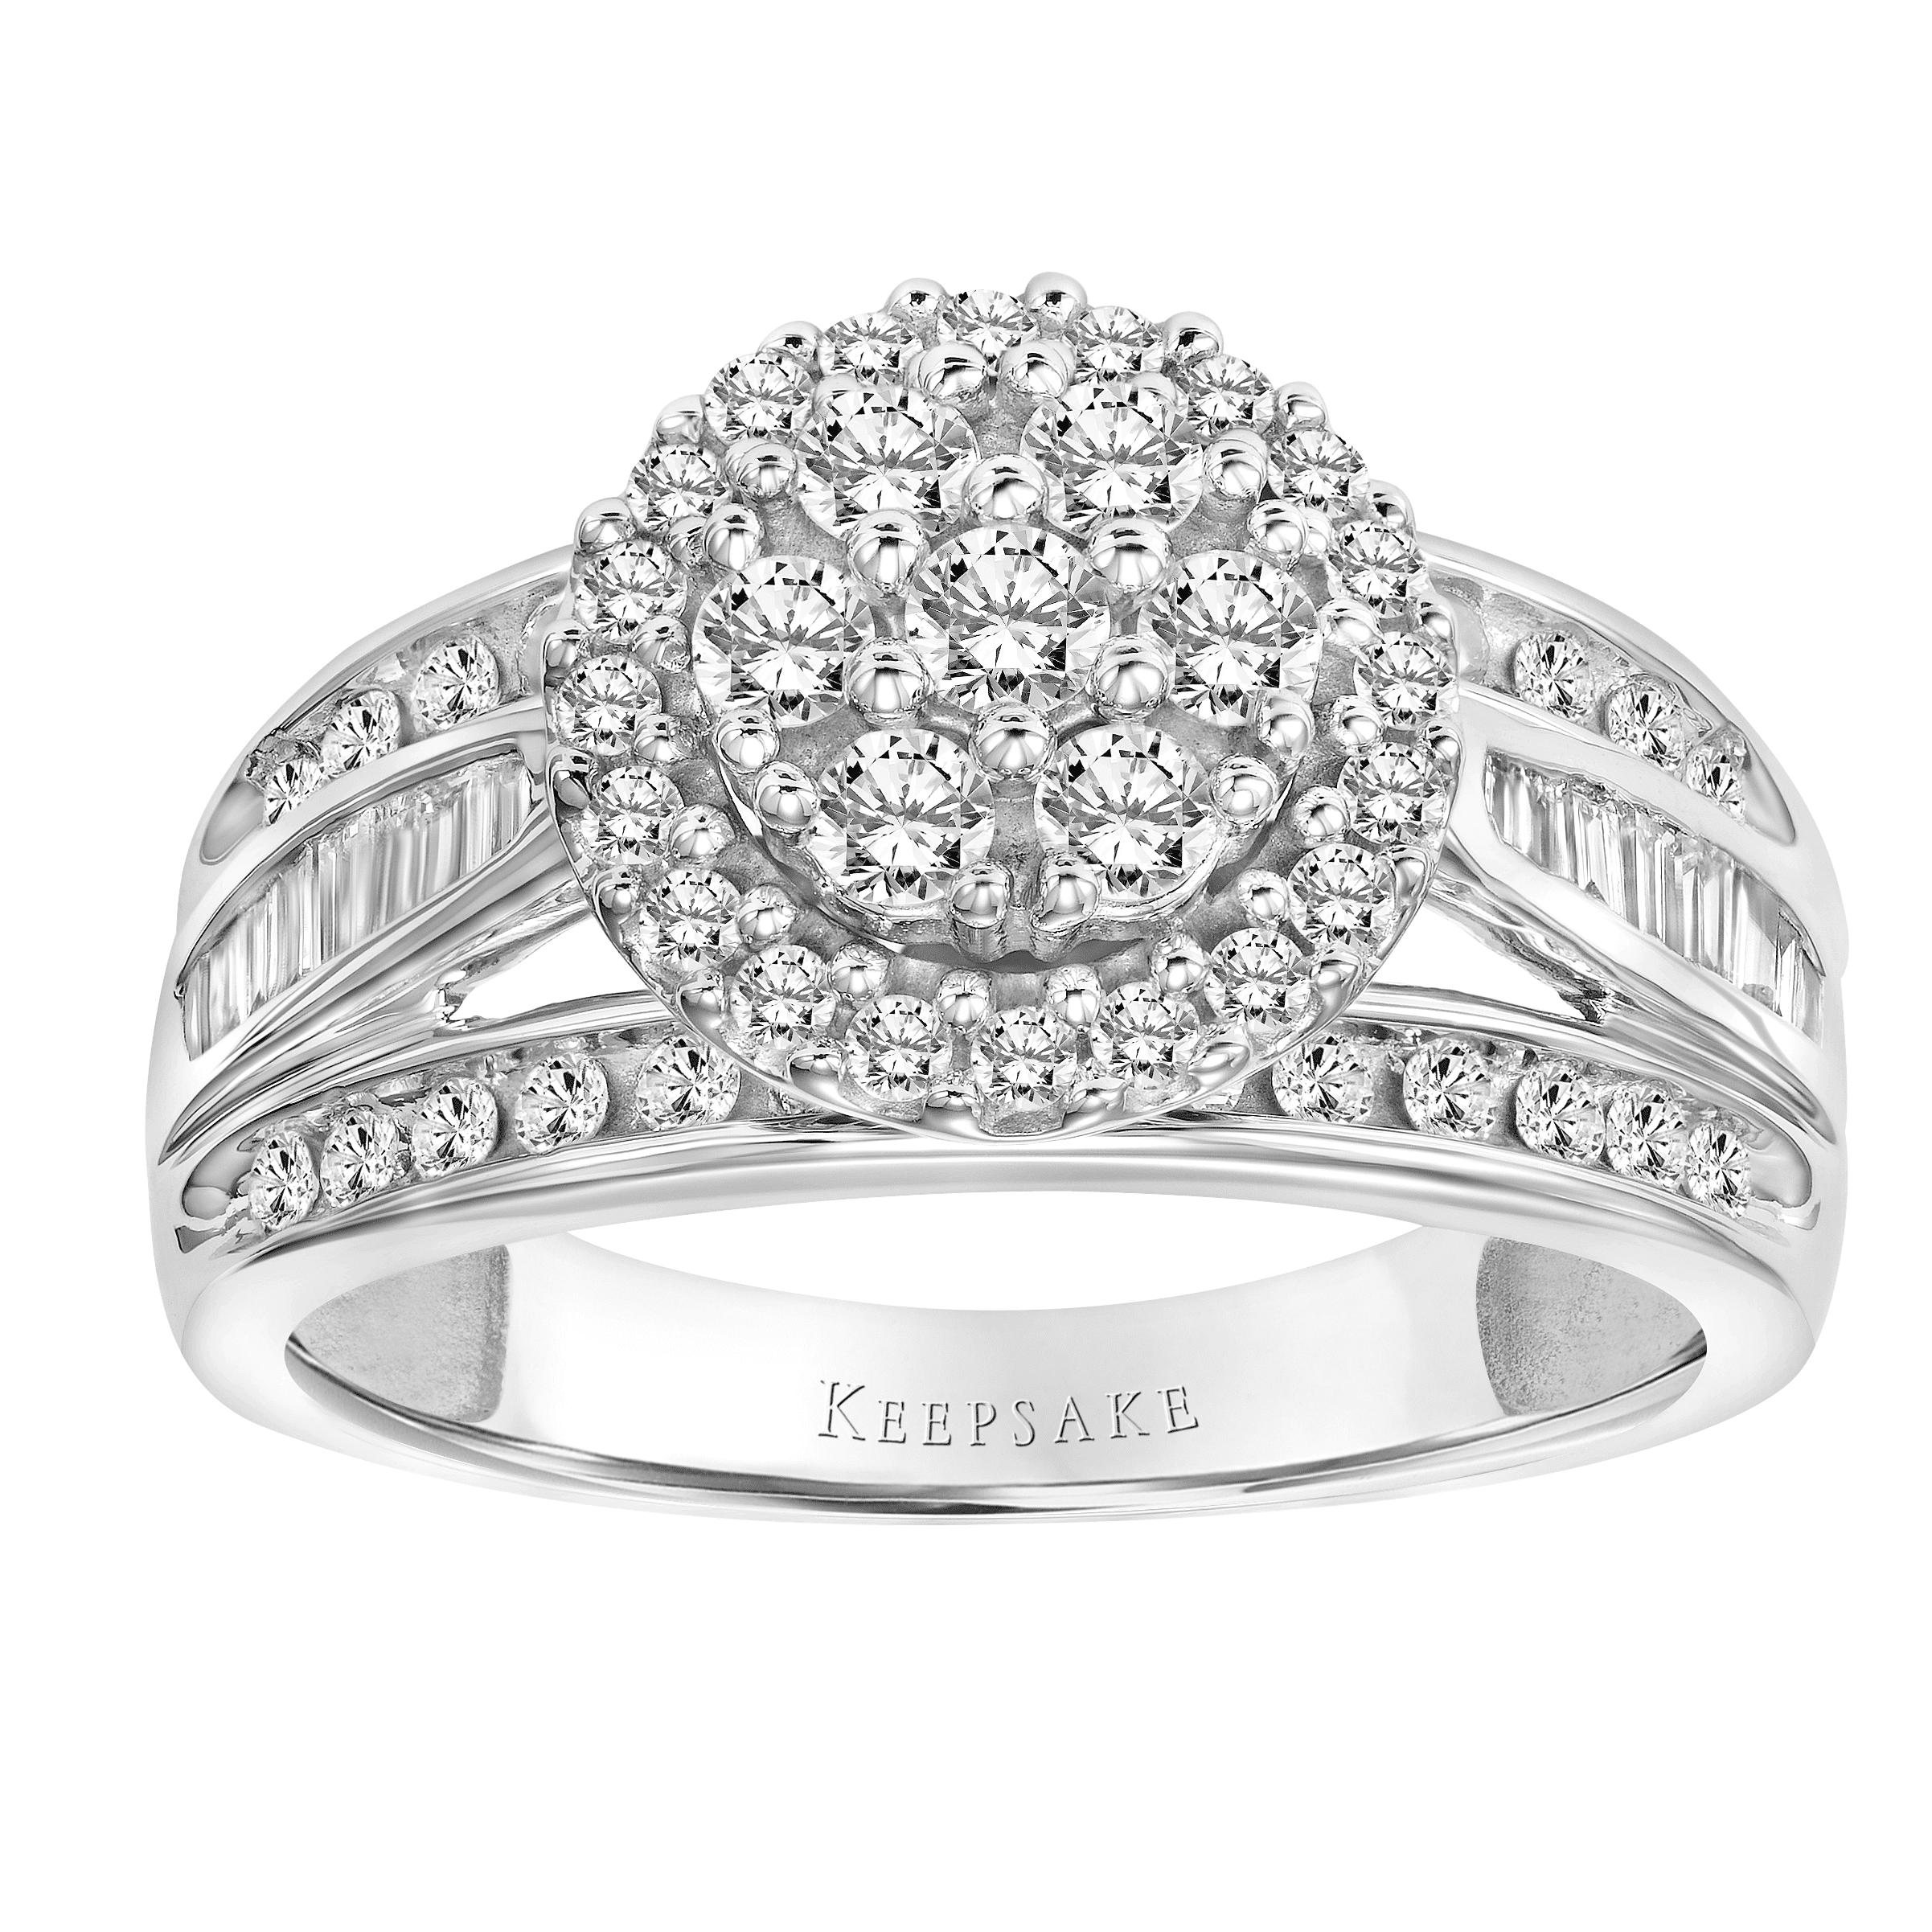 Keepsake Limited Edition 2017 1 Carat T.W. Certified Diamond 10kt White Gold Ring by Frederick Goldman Inc.